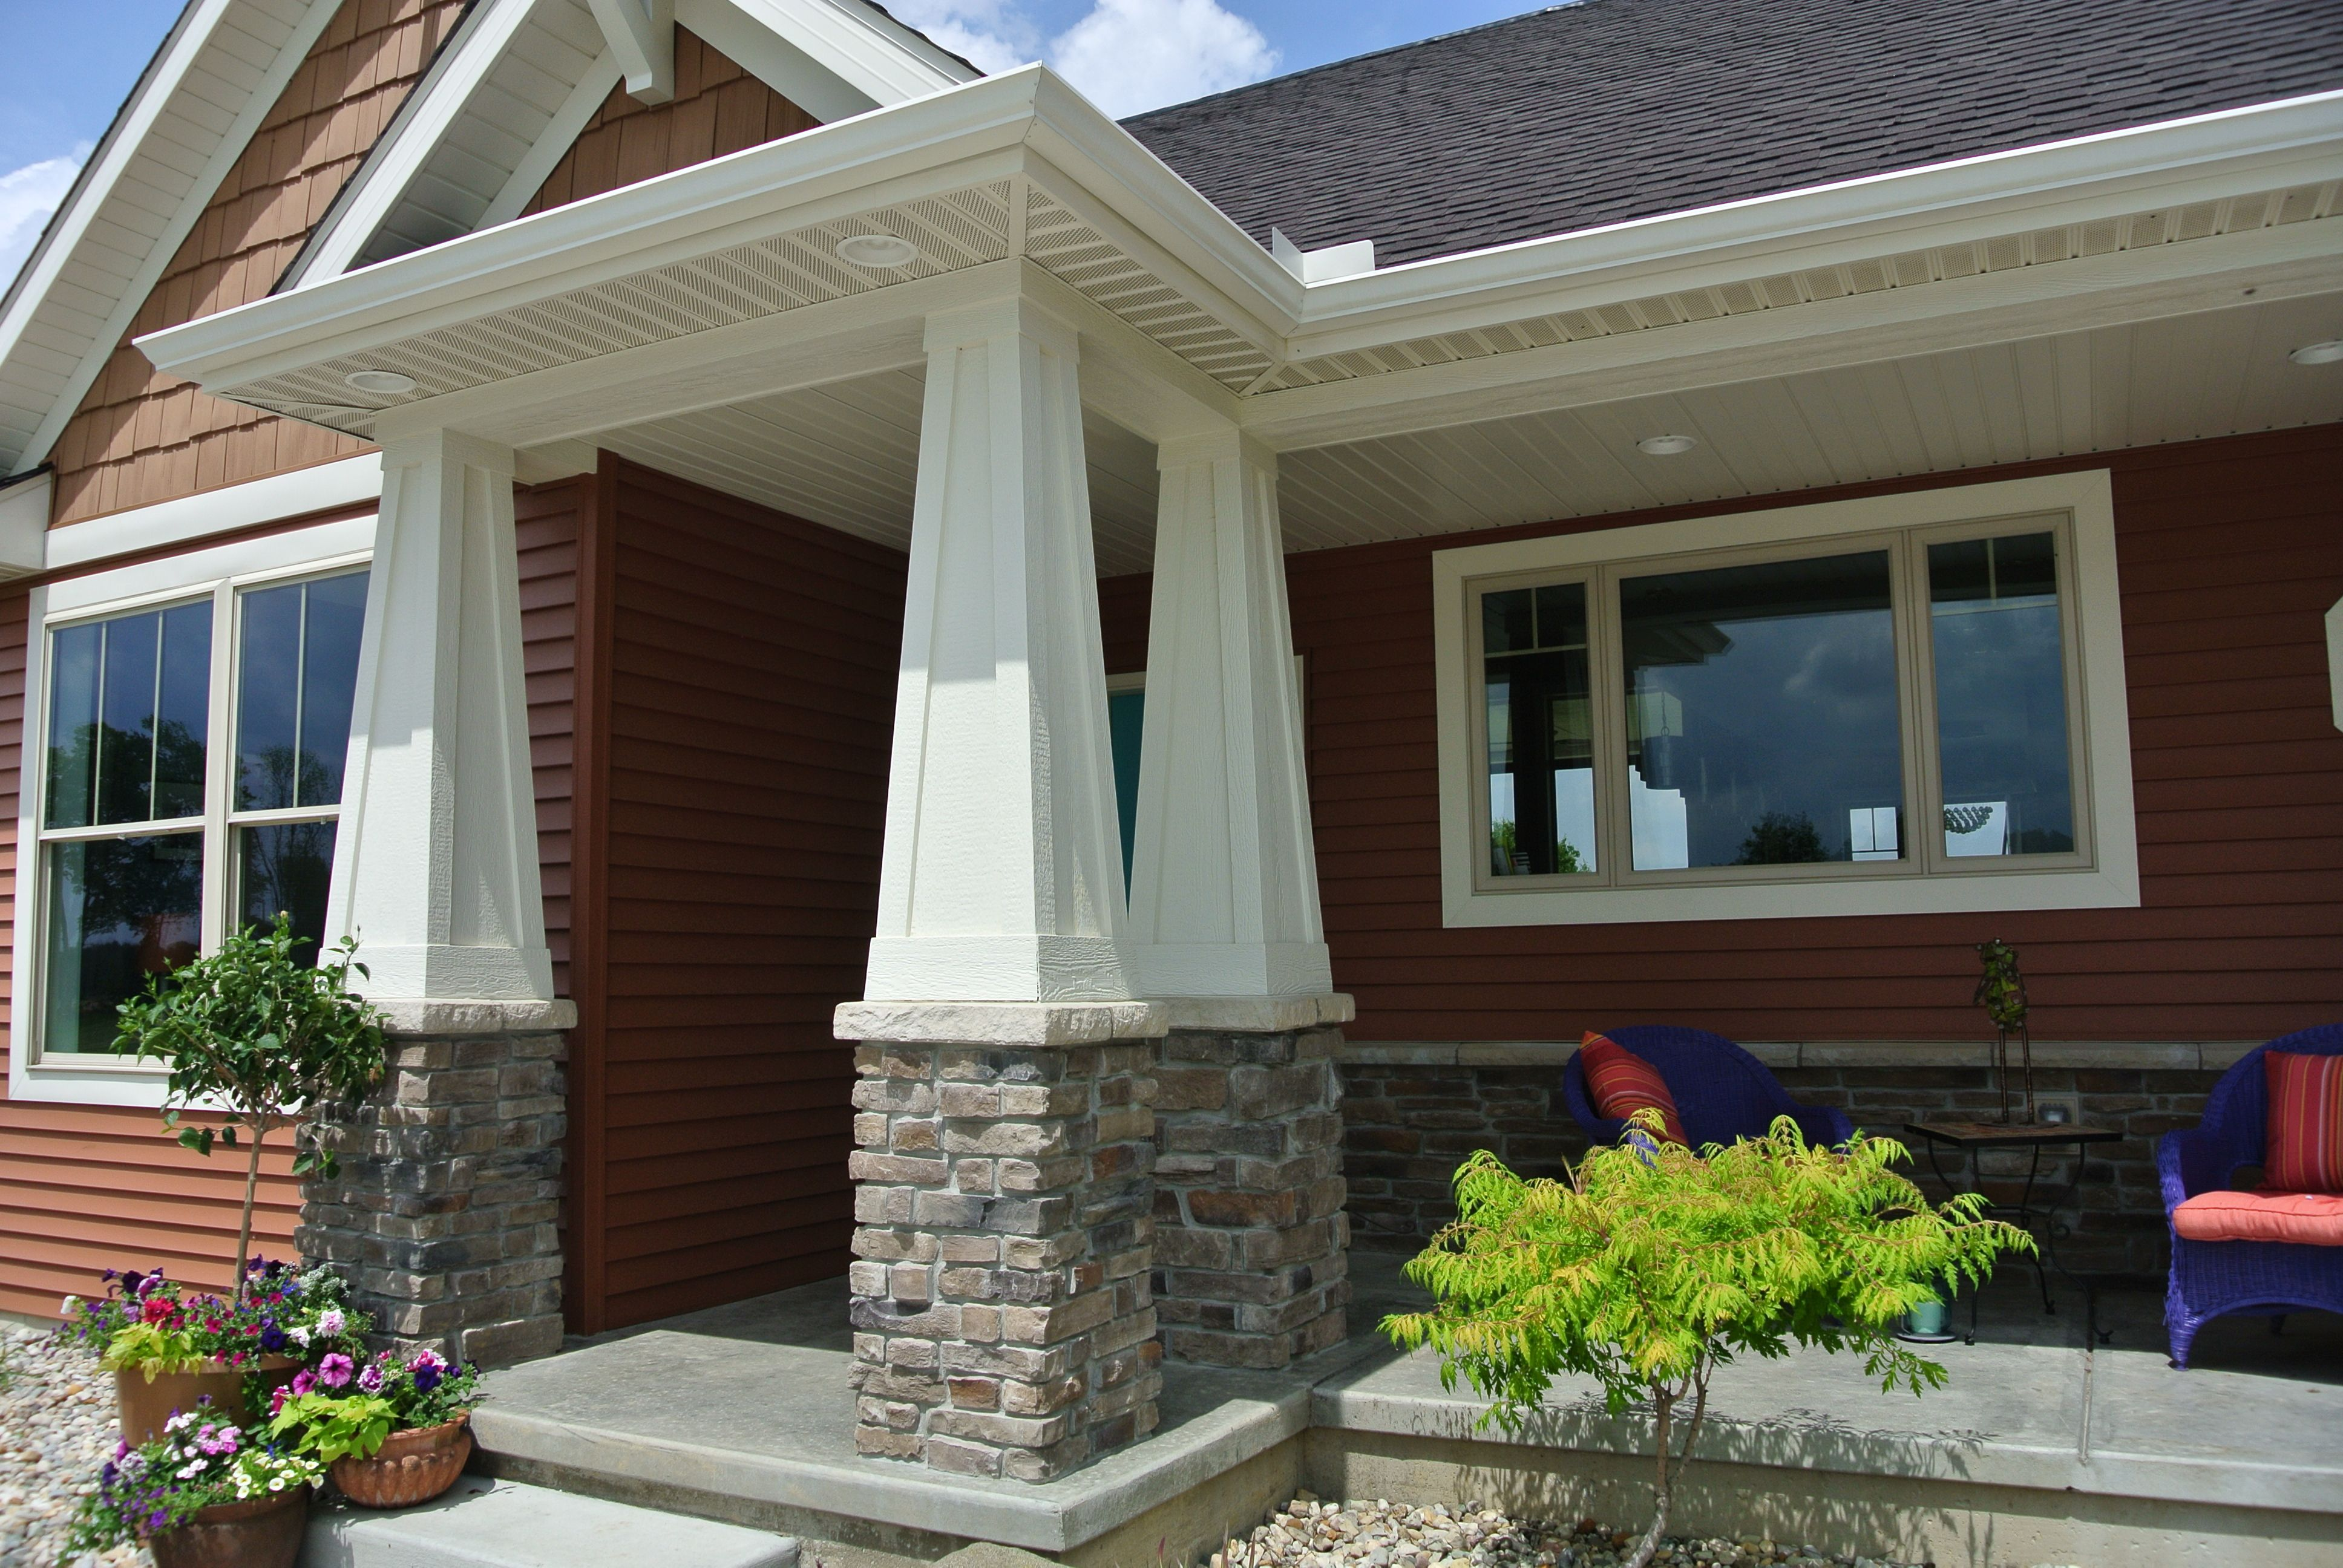 Stoned Front Porch Pillars Heritage Laytite J N Stone